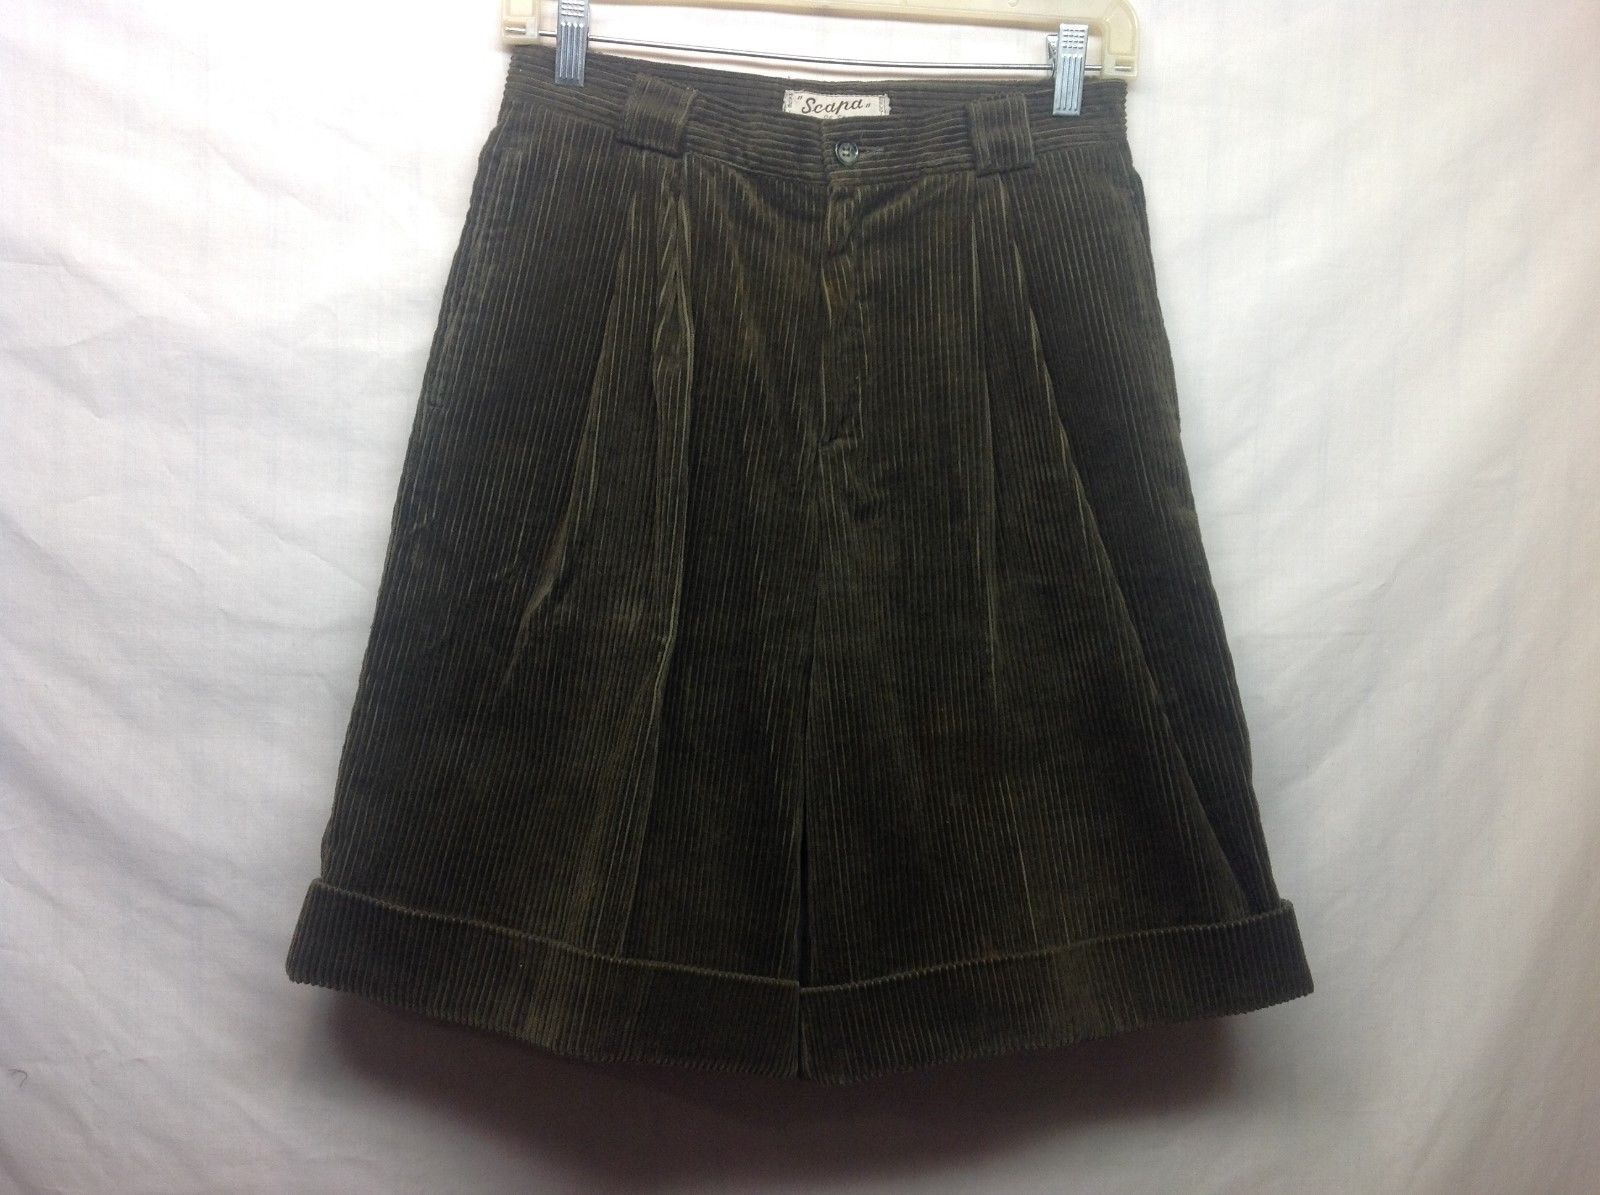 Scapa of Scotland Green Cuffed Corduroy Shorts Sz 14